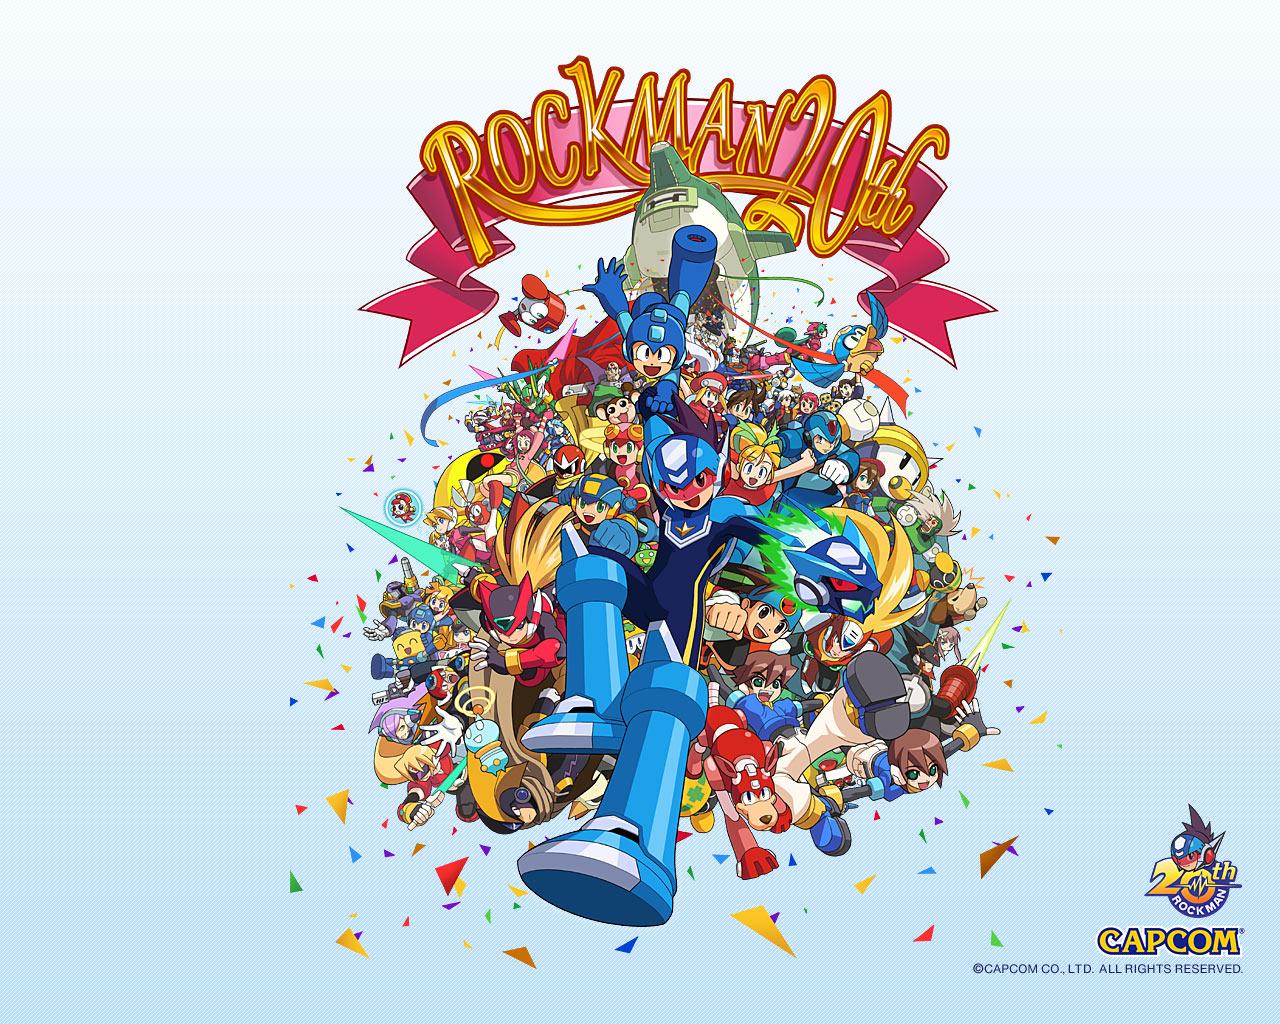 Rockman20th.jpg